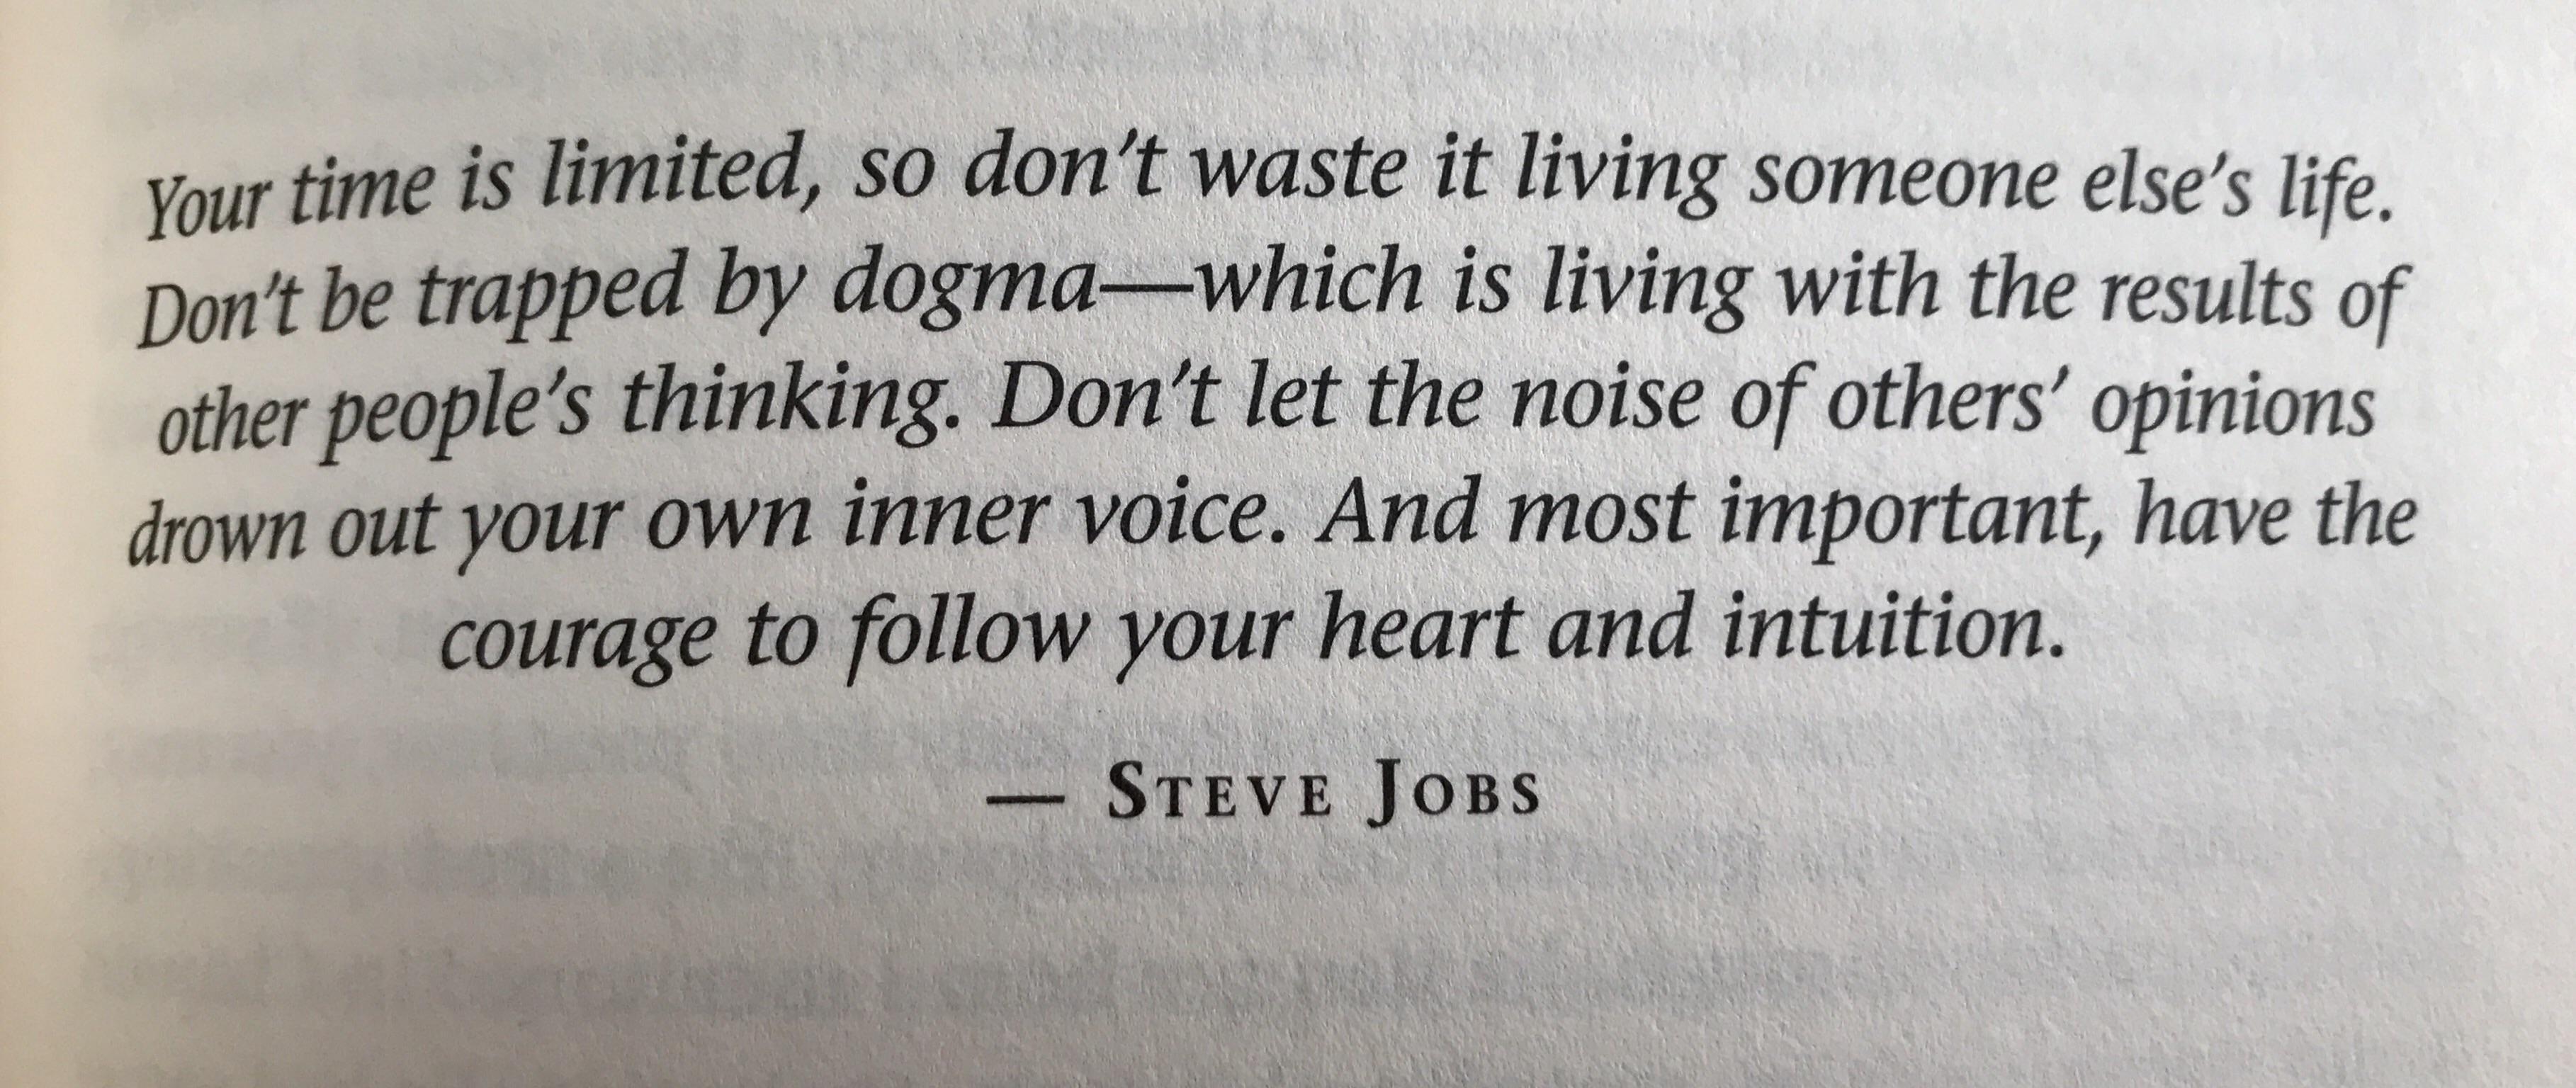 [Image] Steve Jobs